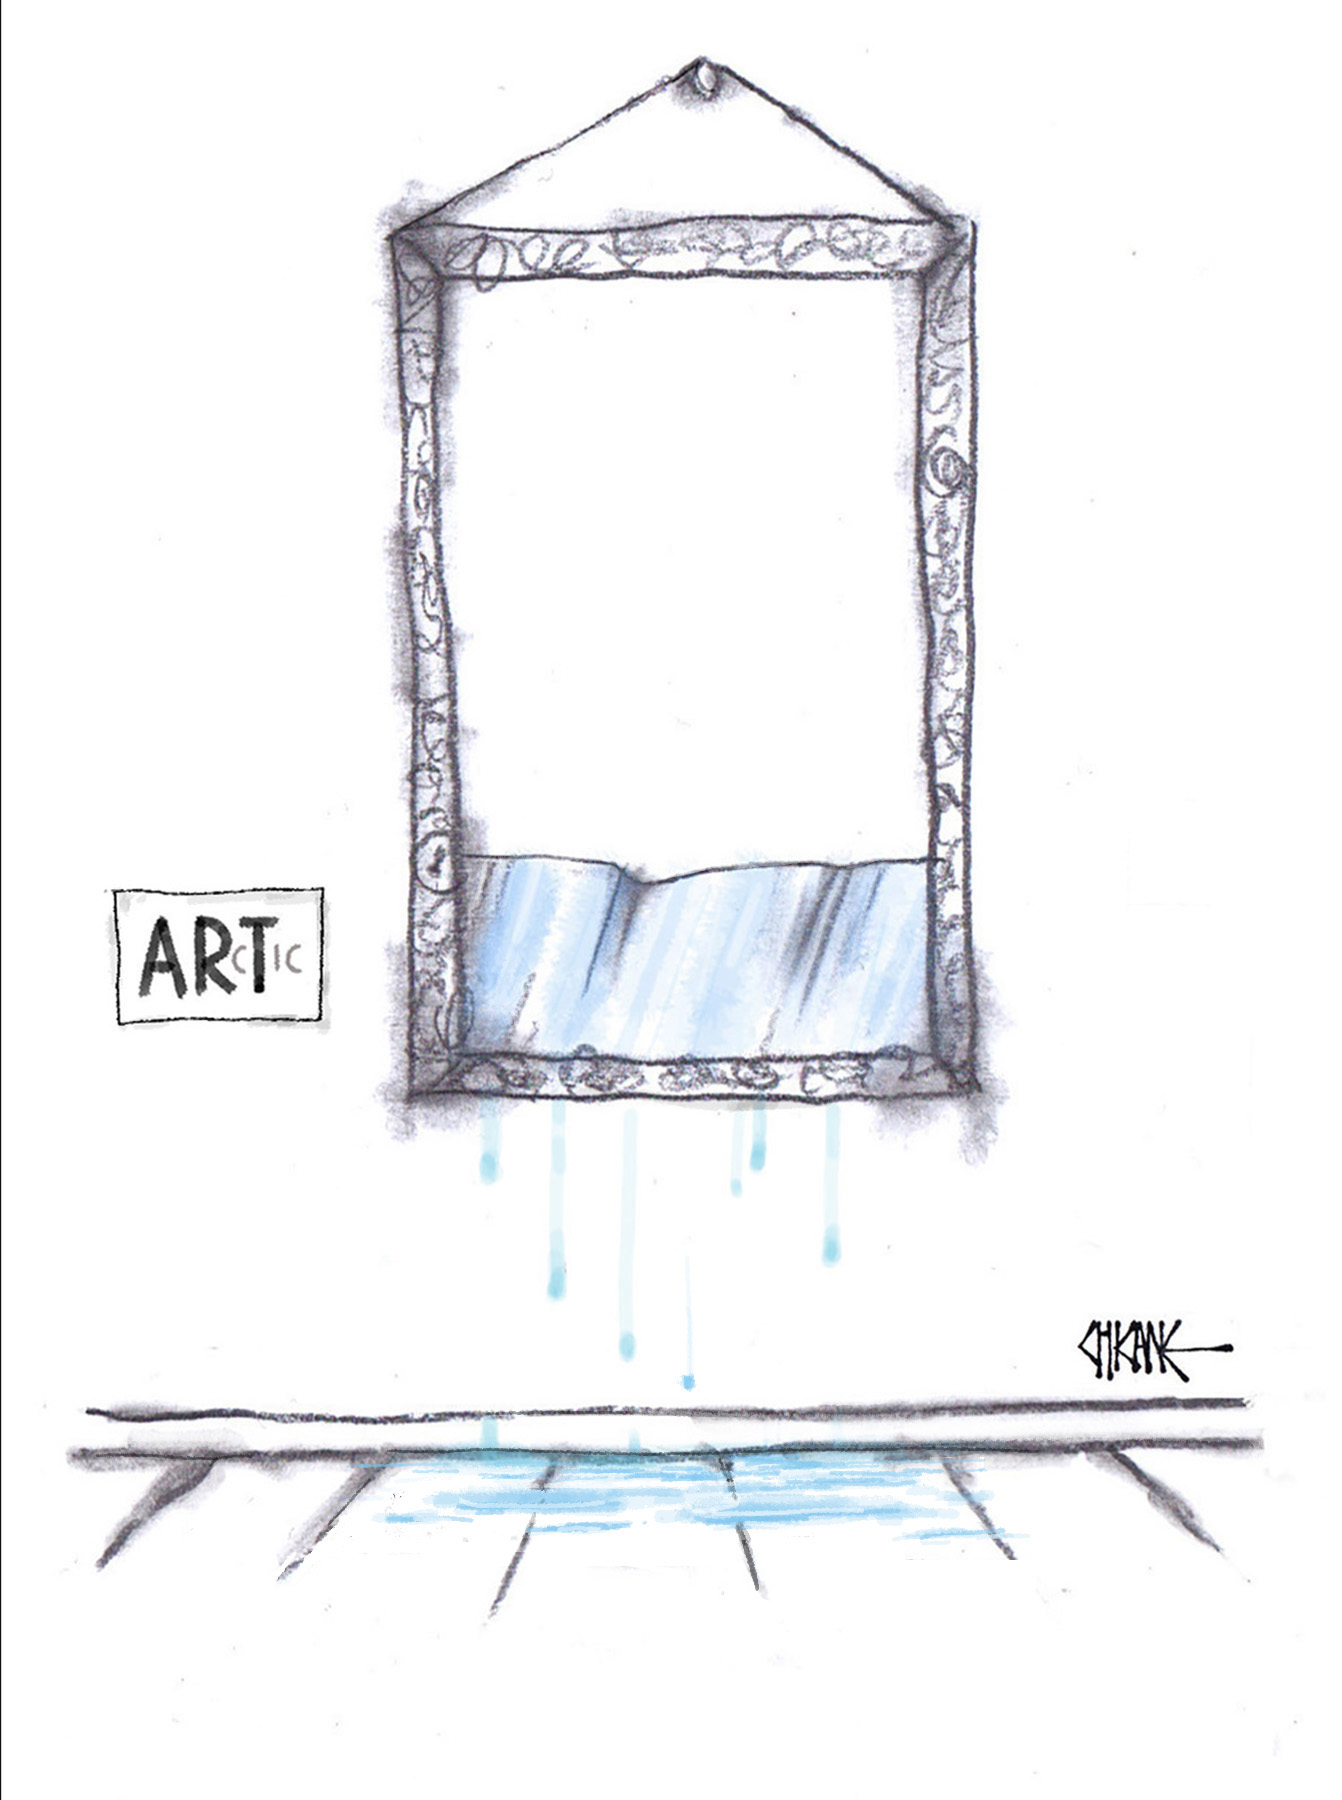 Arctic Art Cartoon by Chicane